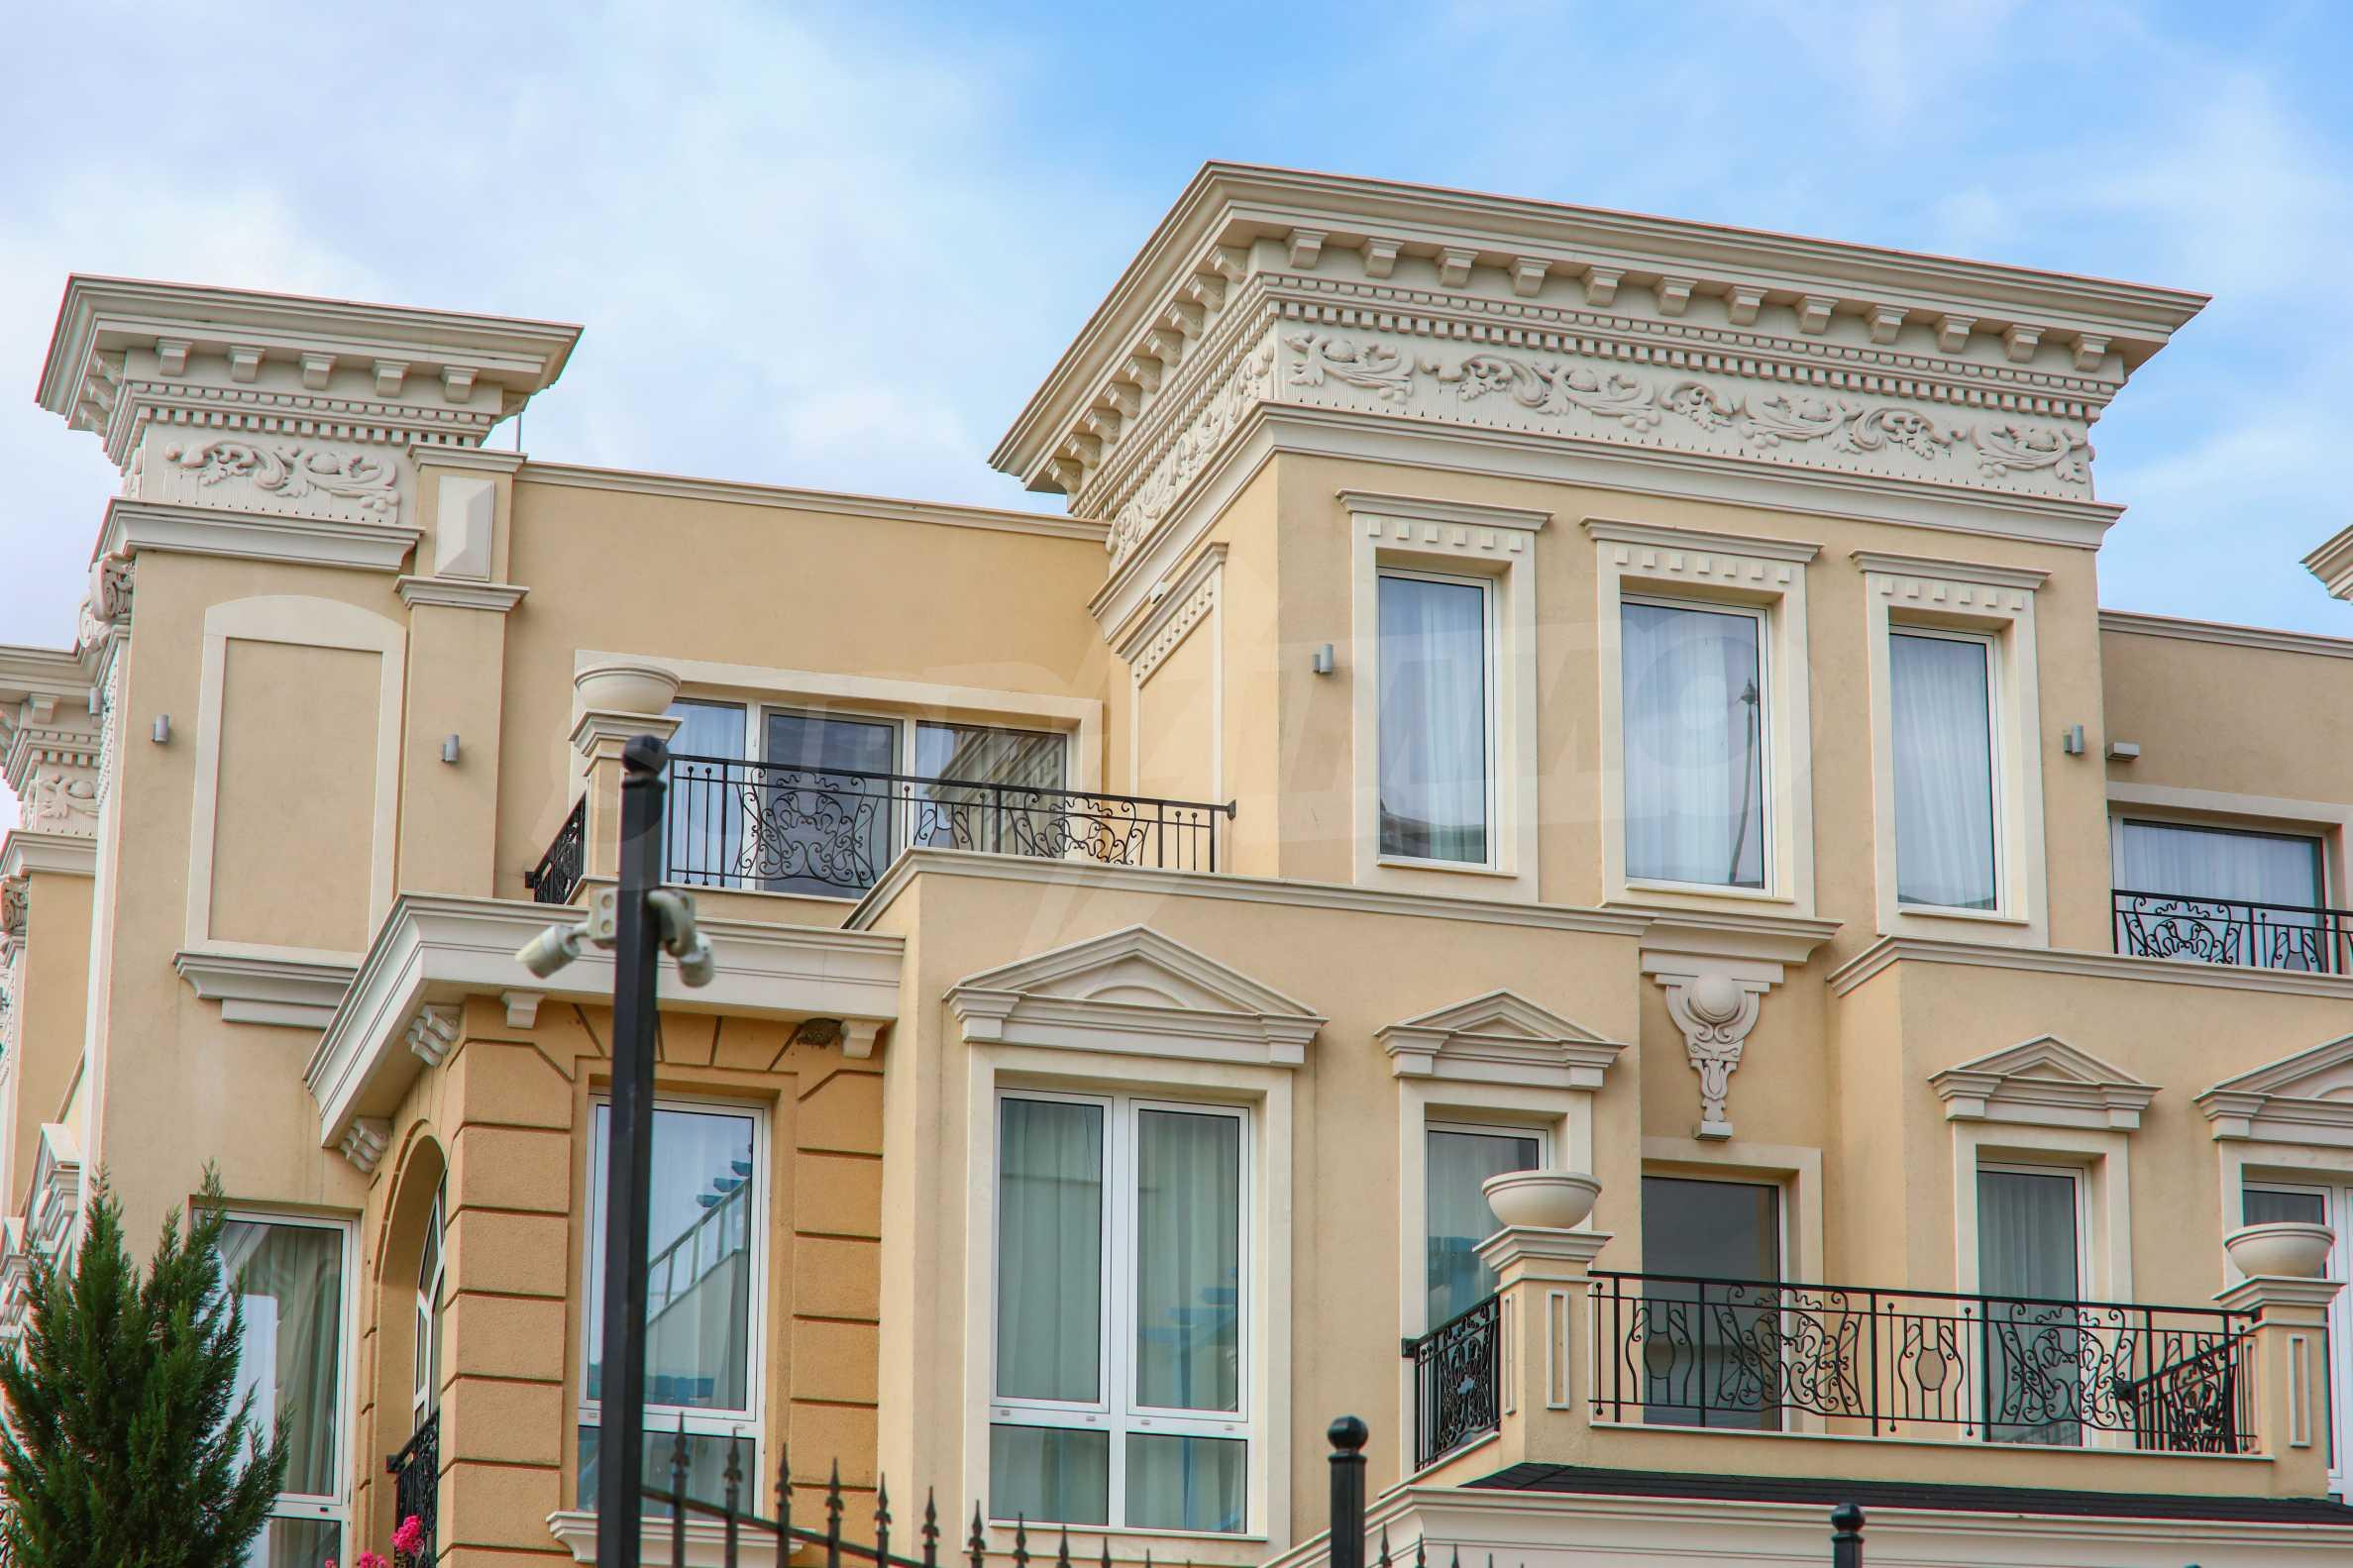 Дизайнерски тристаен апартамент под наем за летен сезон в резиденция Belle Époque в Лозенец 43